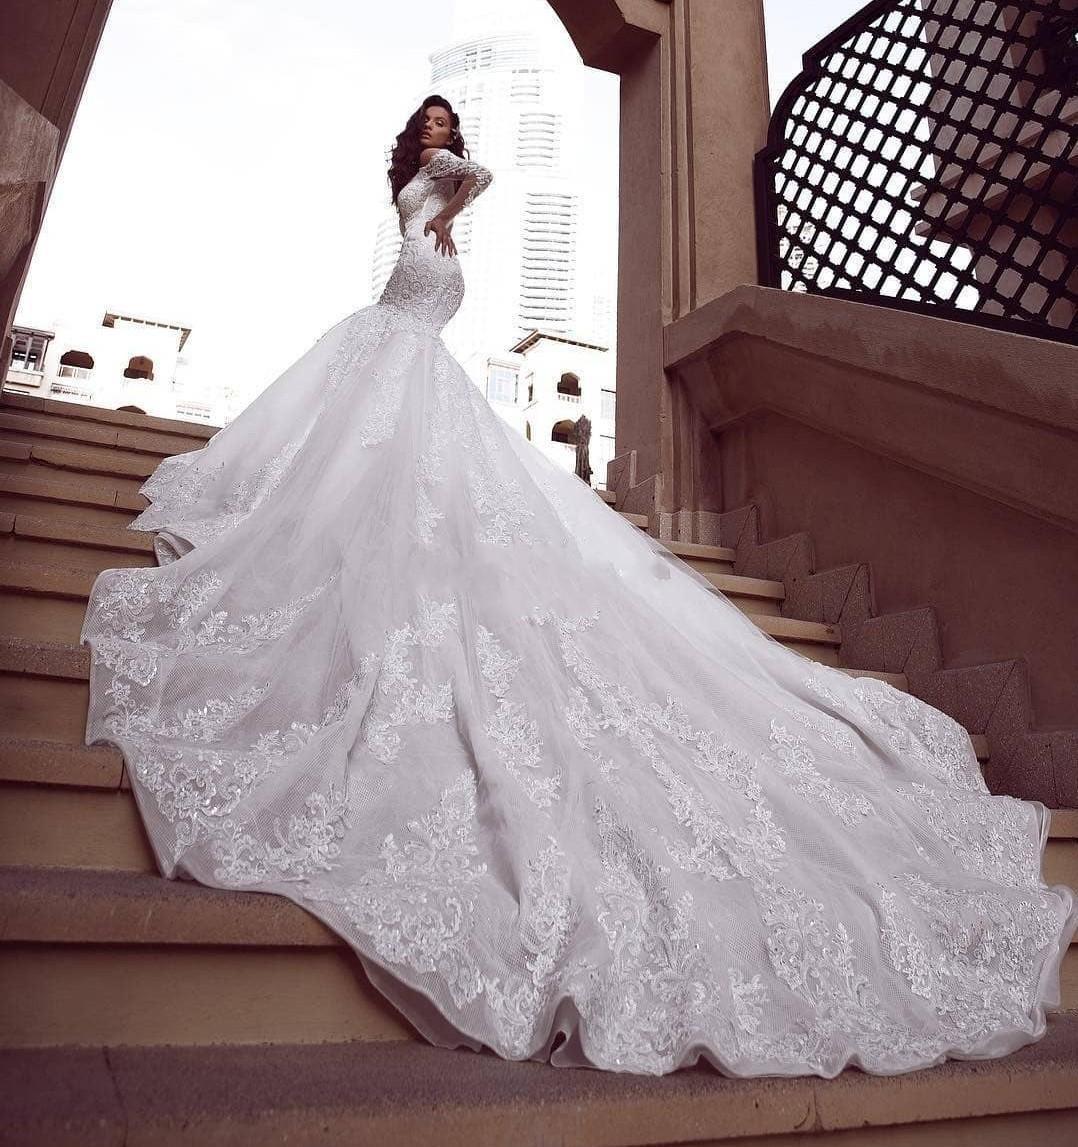 Gorgeous Luxury Plus Size Mermaid Lace Wedding Dresses Plunging Neck Long Sleeves Beaded Wedding Dress Bridal Gowns Vestido De Novia